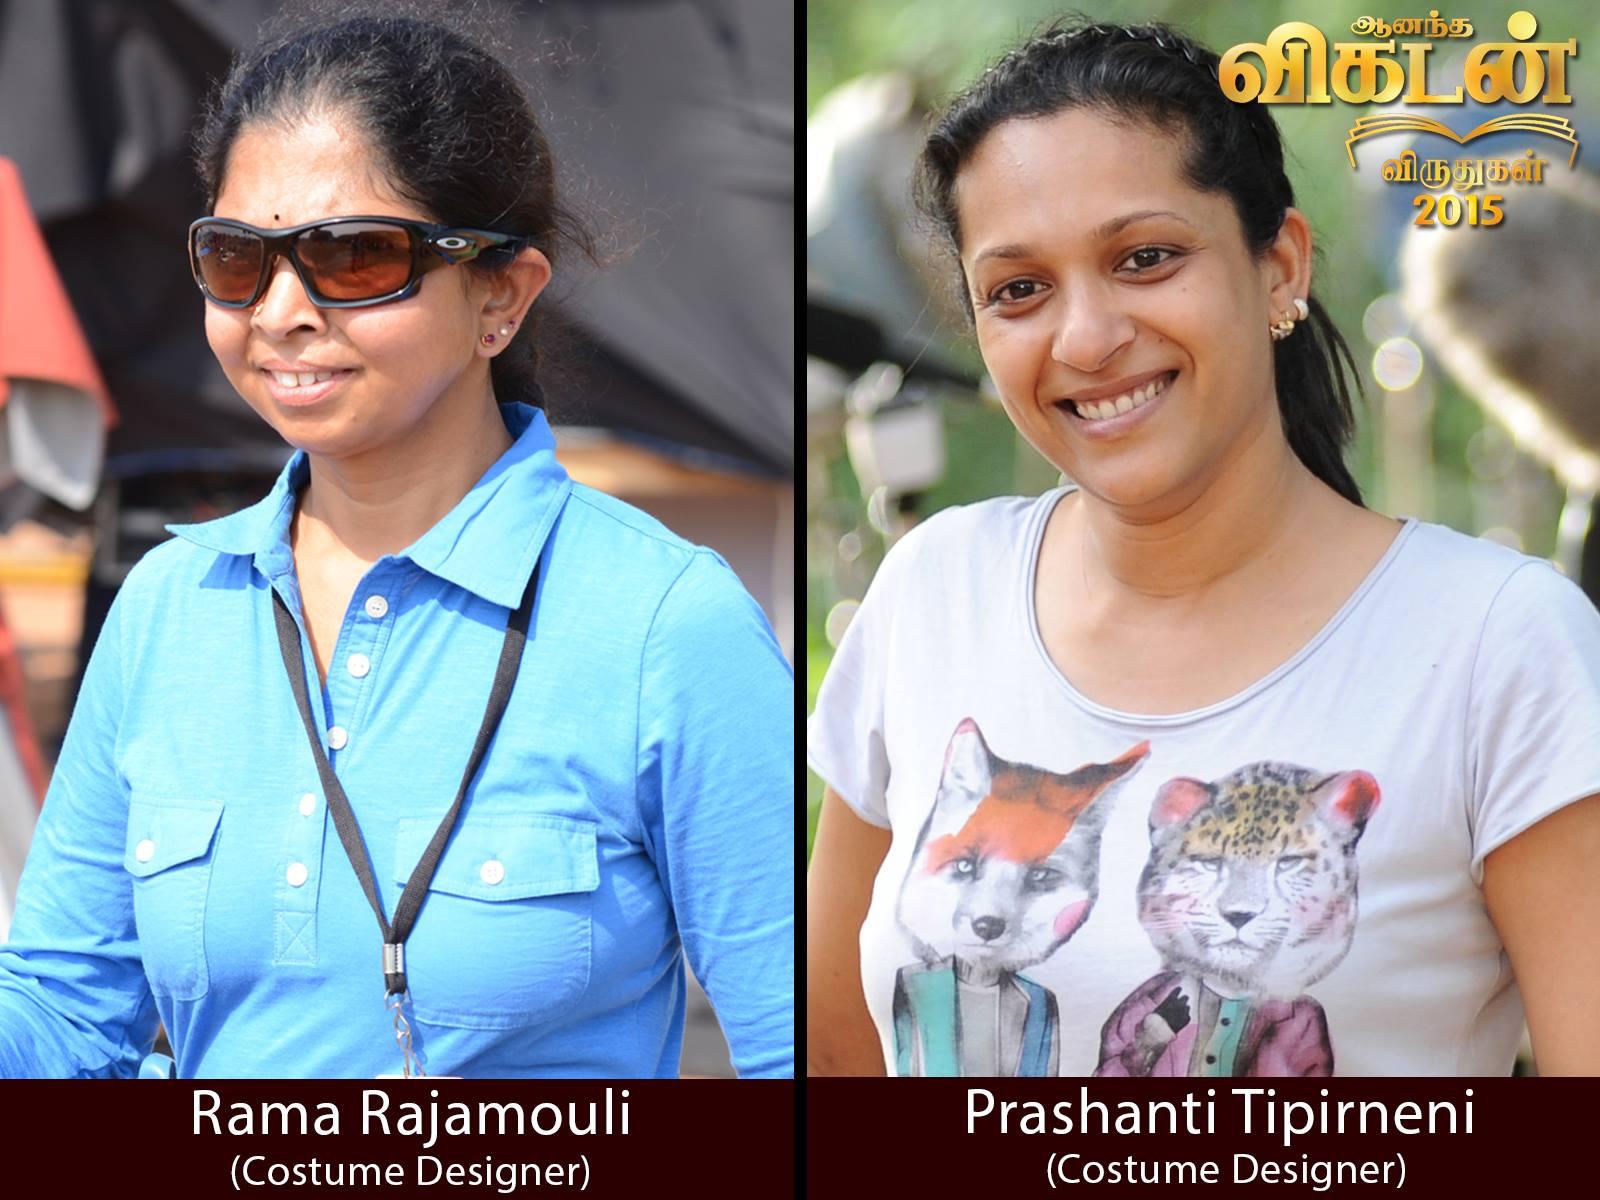 Baahubali On Twitter Congratulations To Our Costume Designers Rama Rajamouli And Prashanti Tipirneni Vikatanawards2015 ப க பல Https T Co Itgzy66bf1